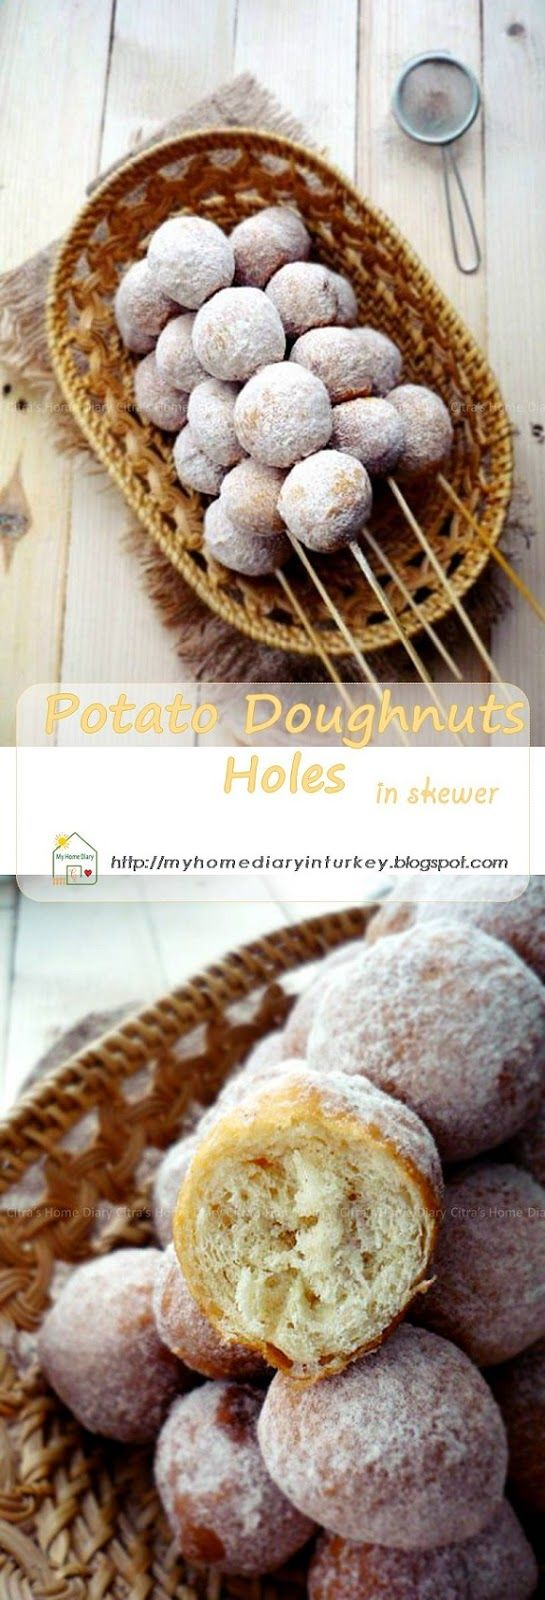 Potato Doughnuts holes in skewer